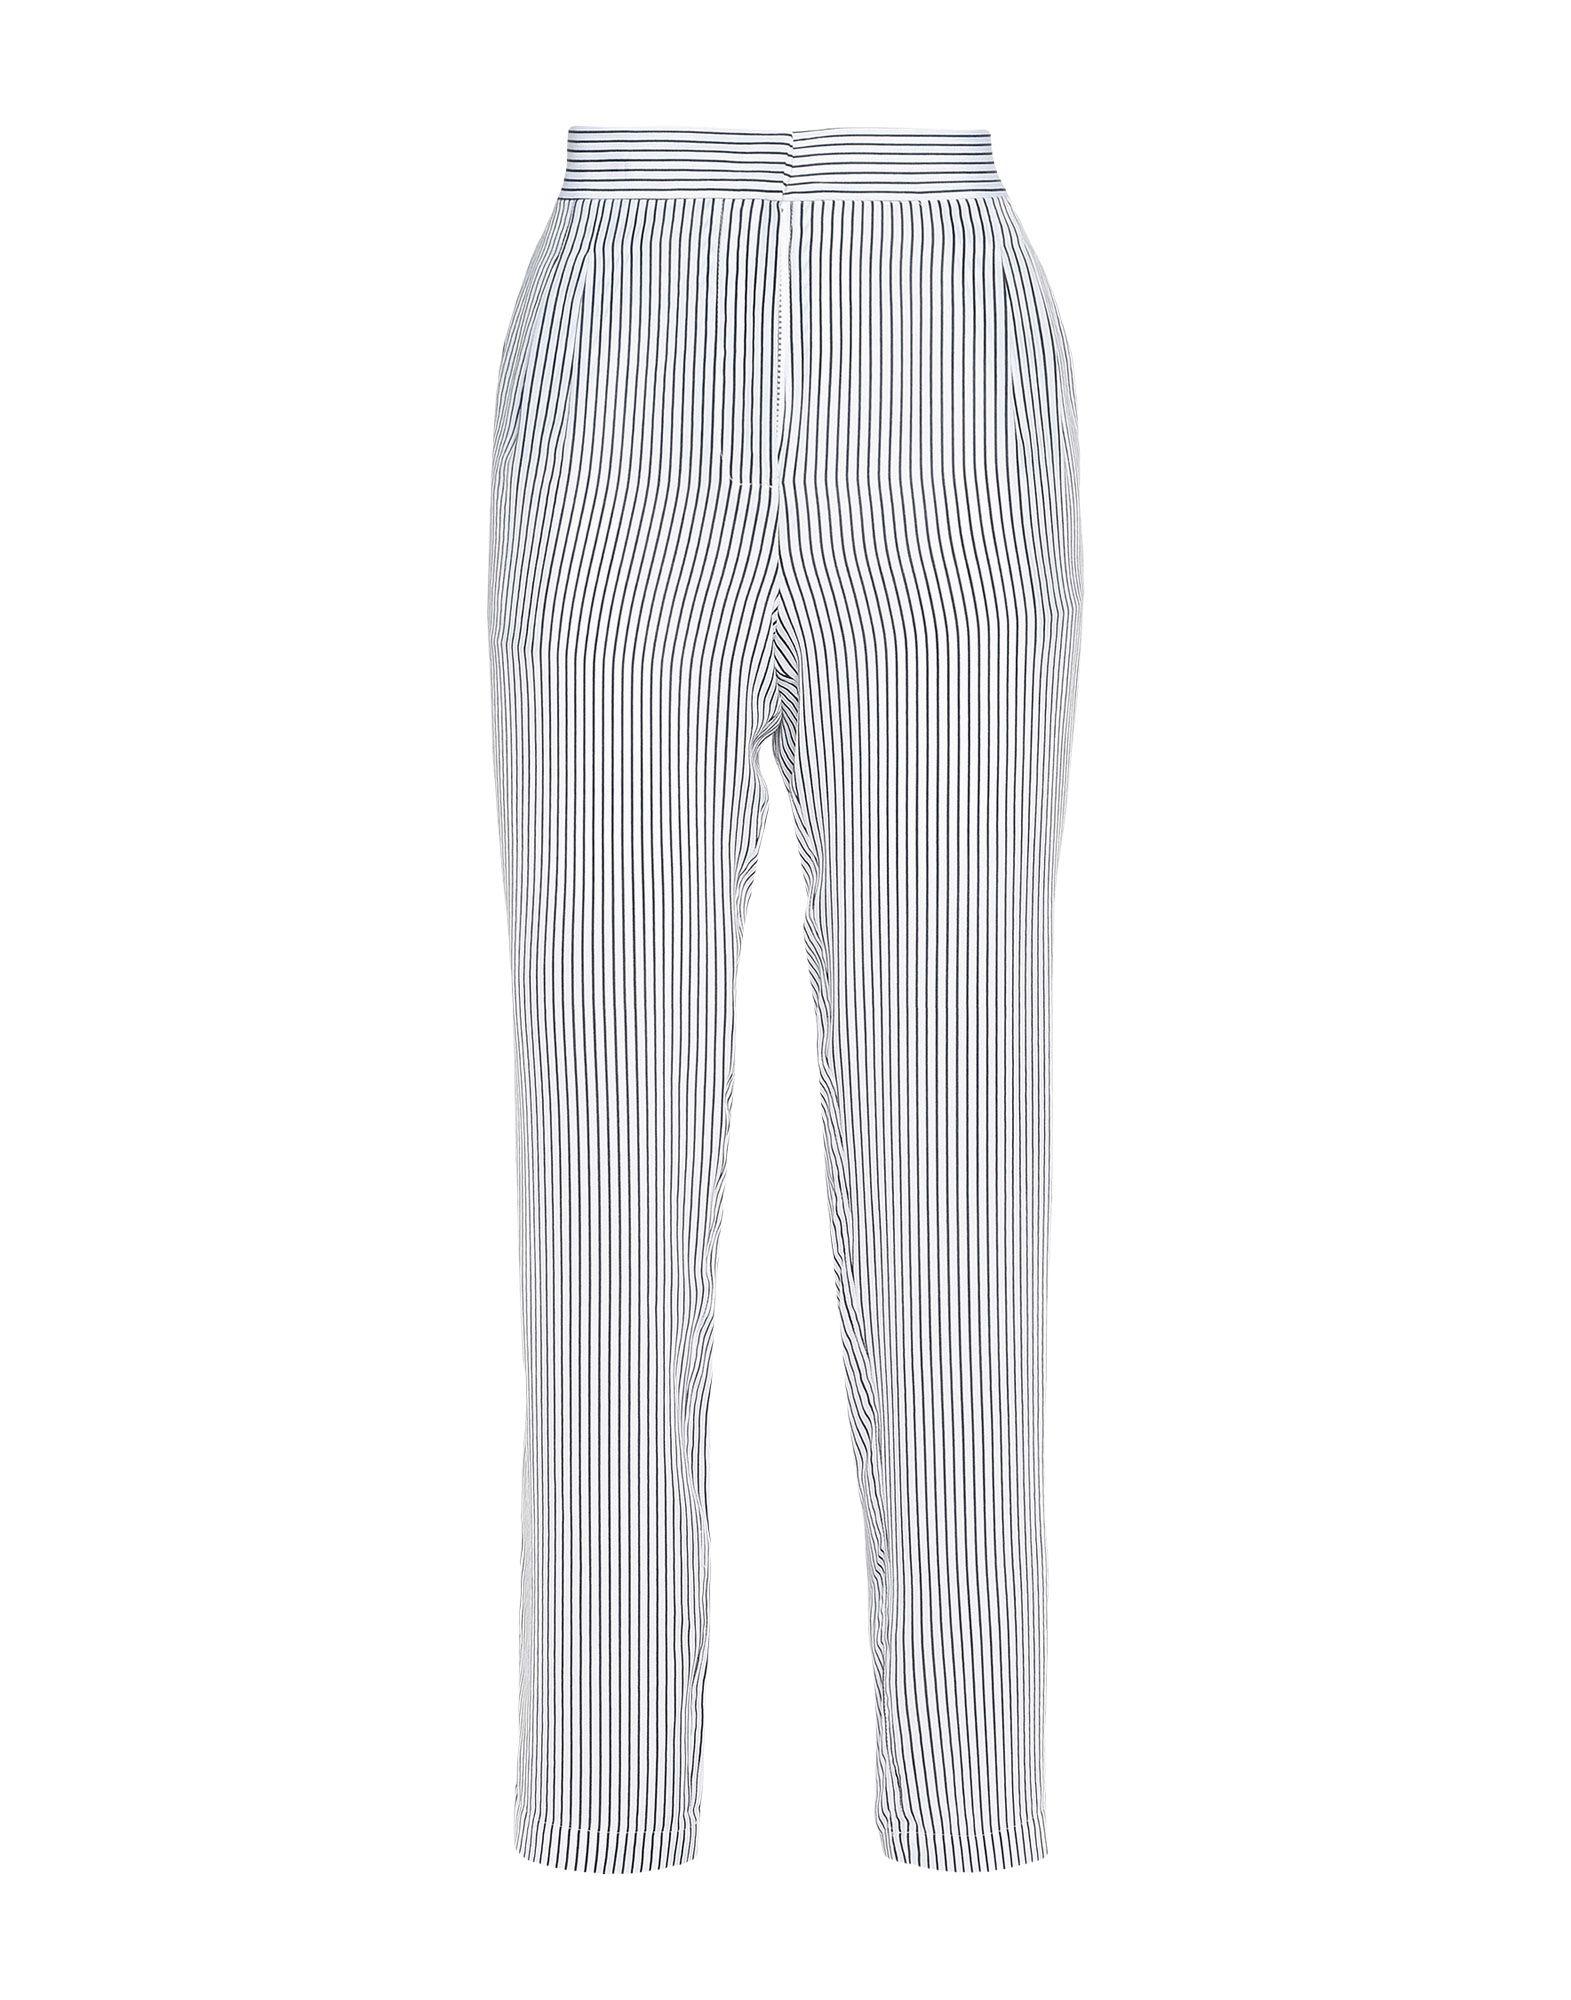 Pantalone Equipment Donna - Acquista online su 4mAKe9Ayoq